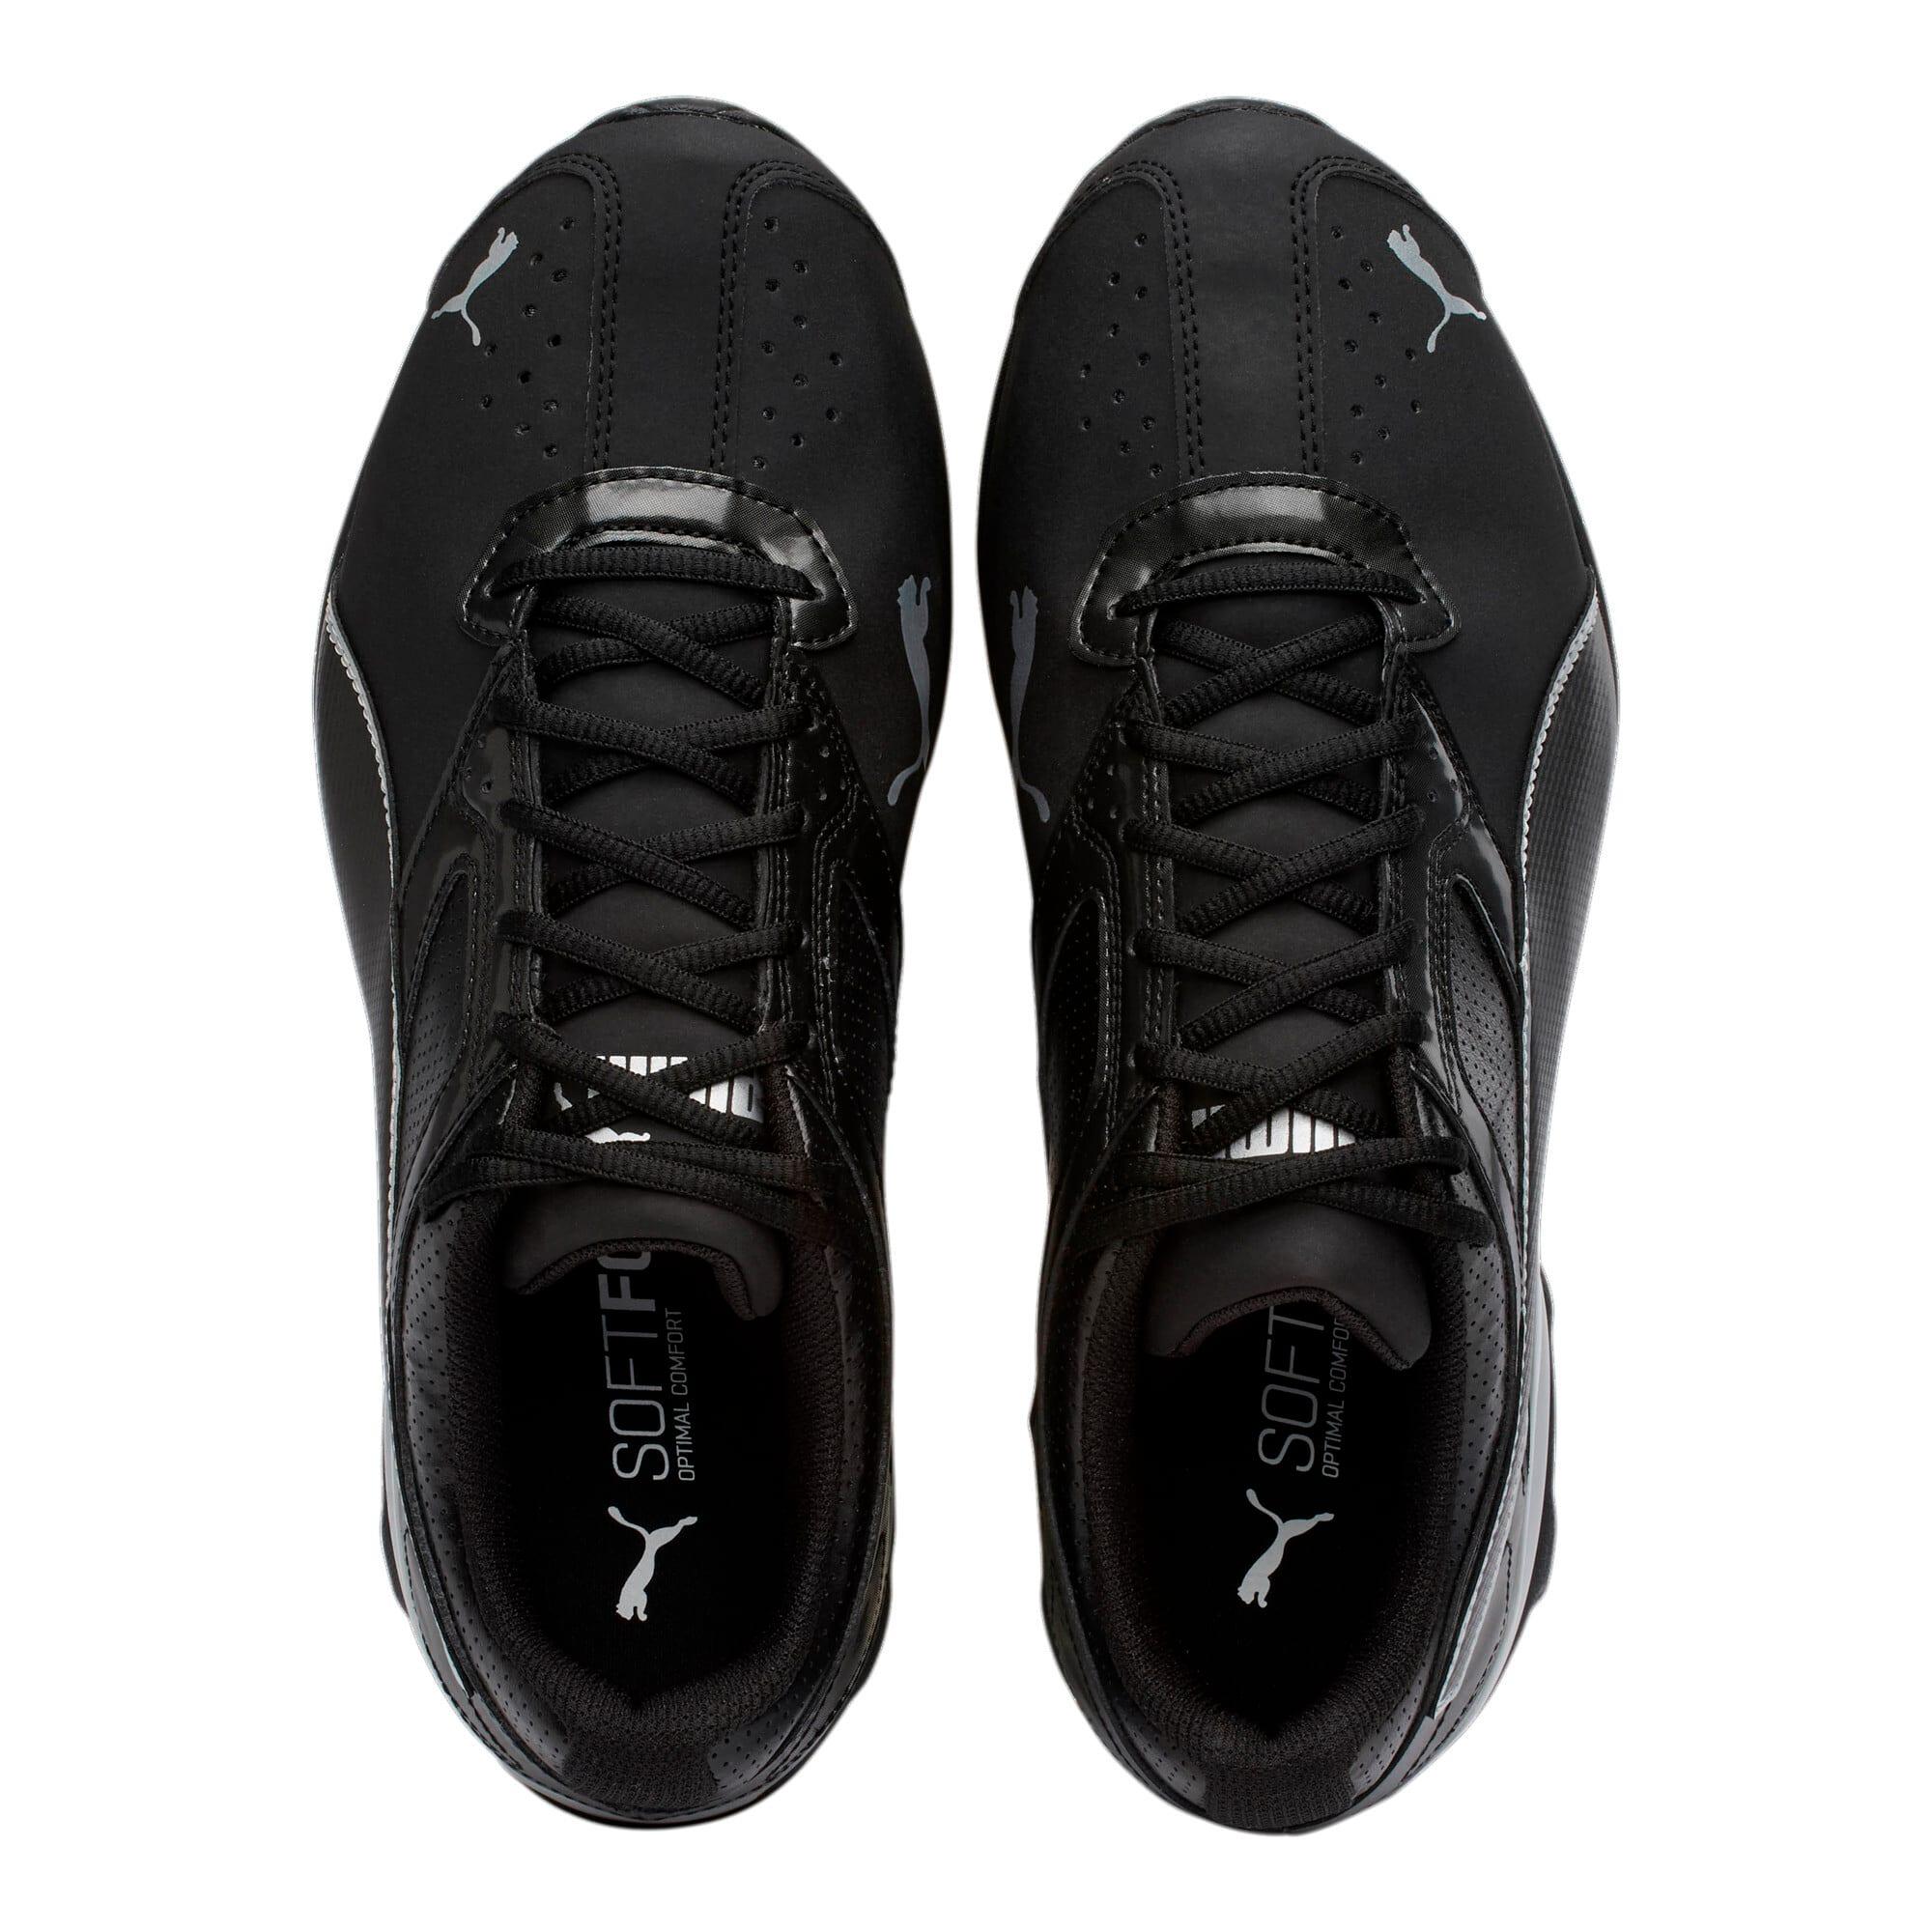 Thumbnail 6 of Tazon 6 FM Men's Sneakers, Puma Black-puma silver, medium